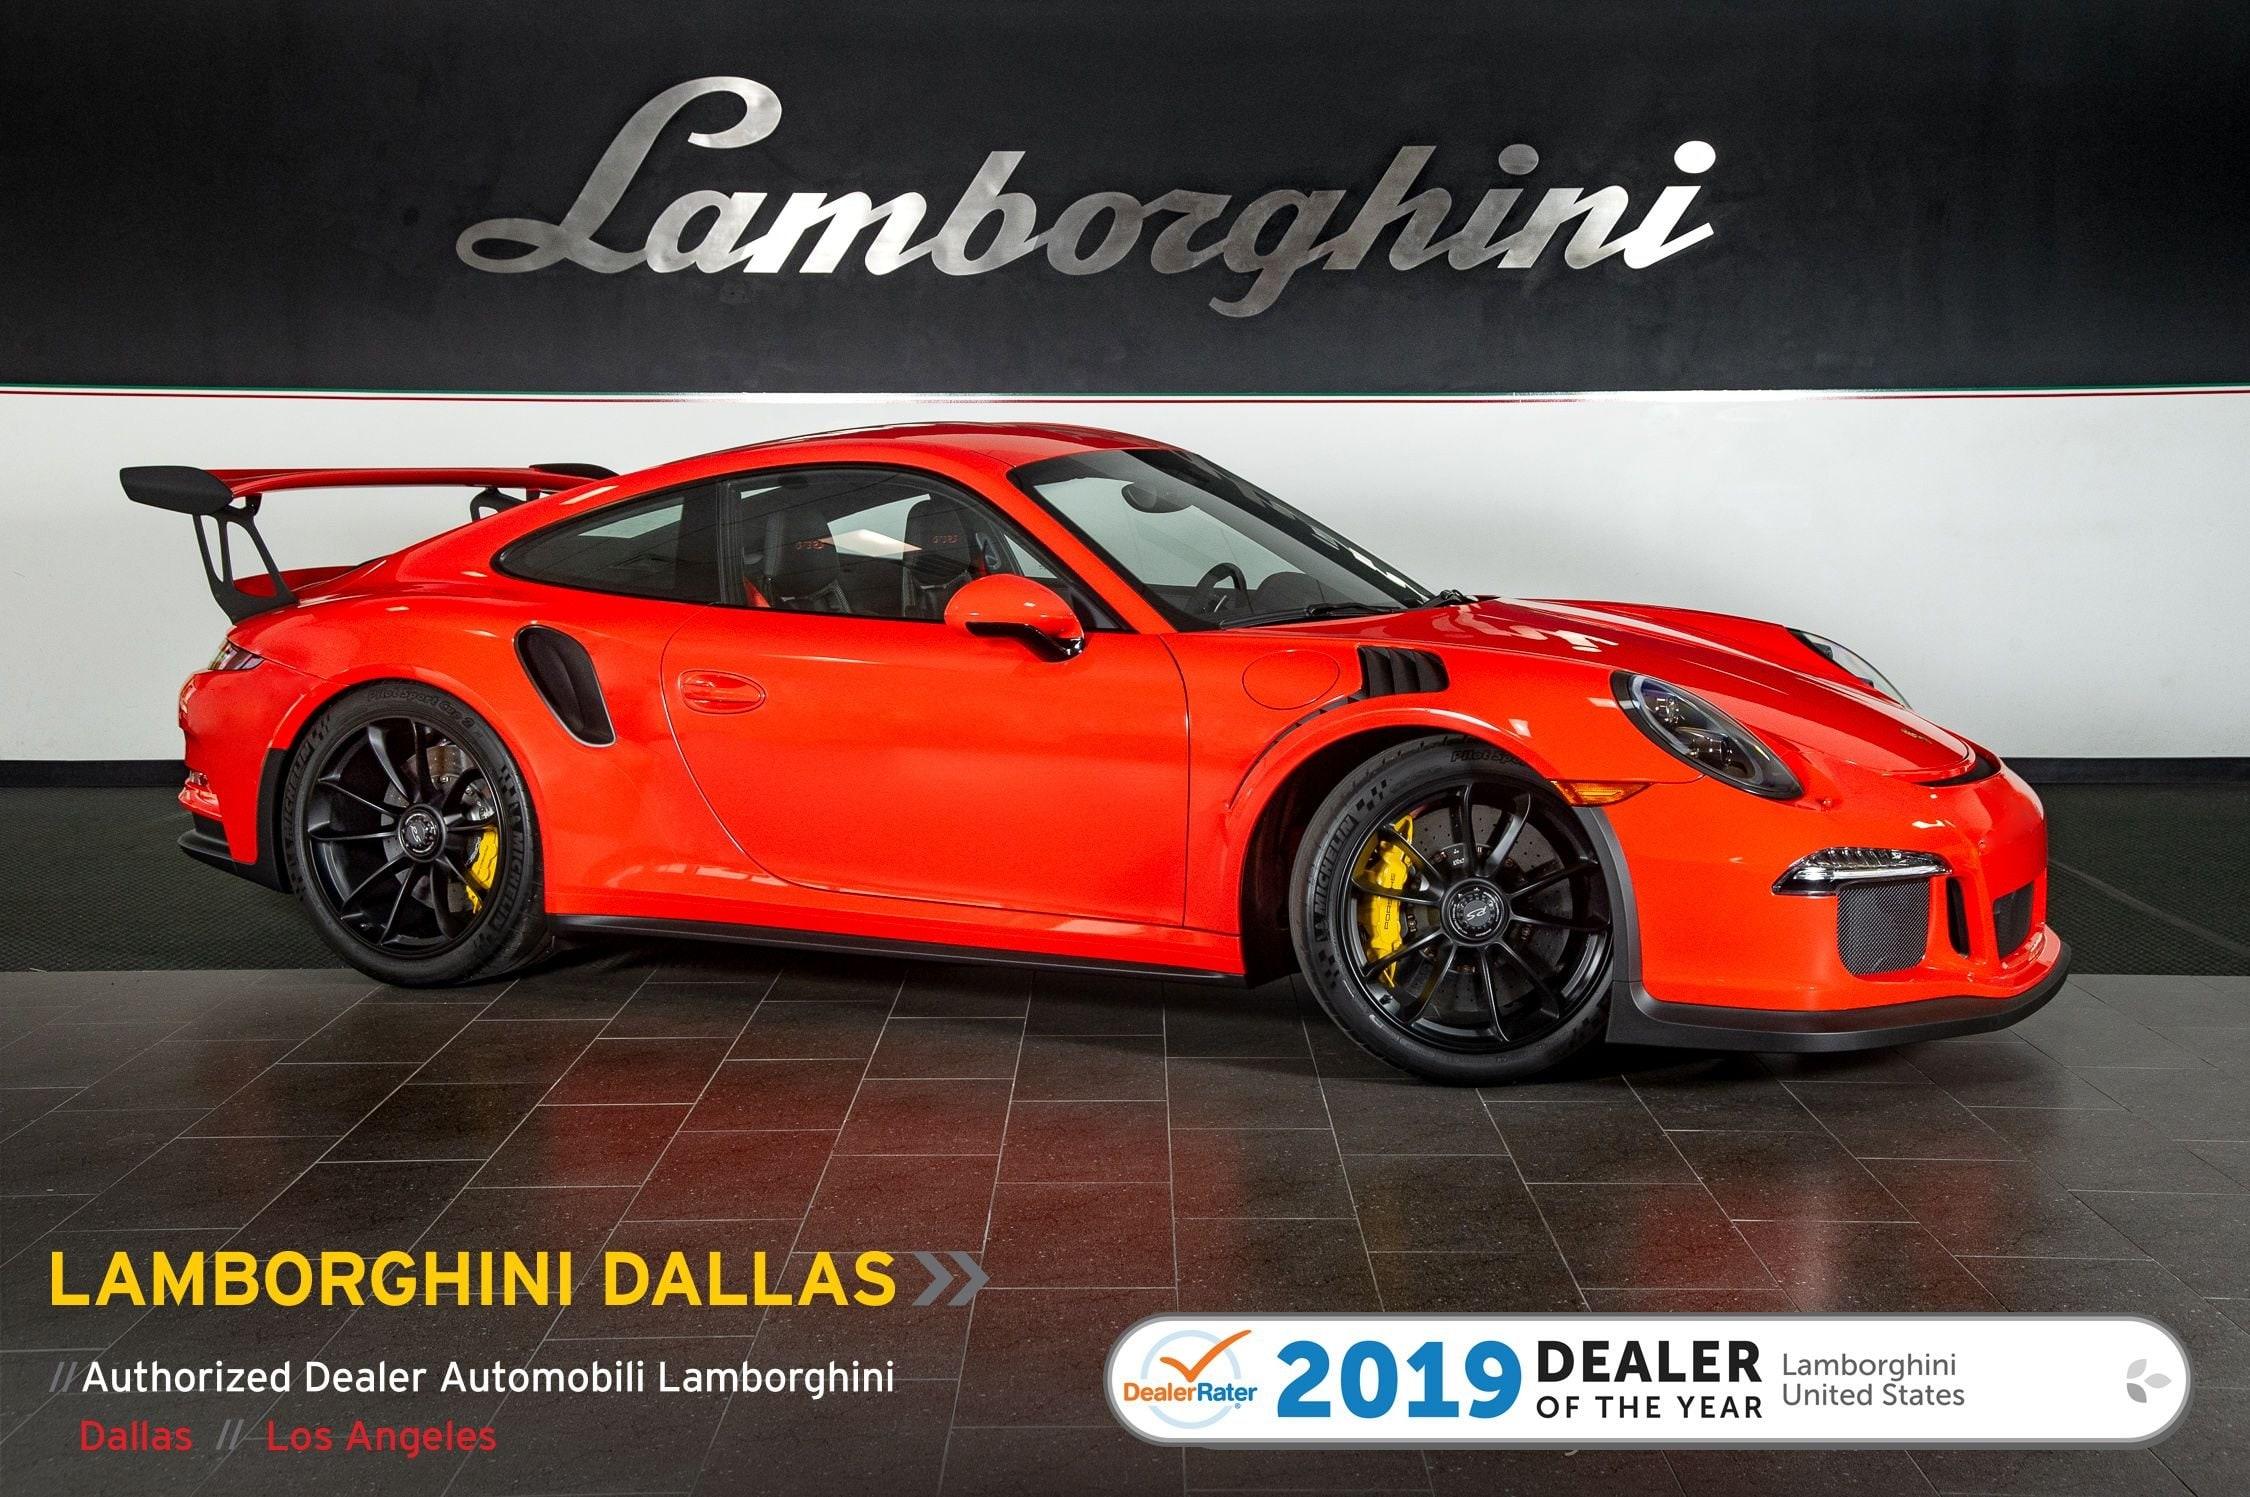 Used 2016 Porsche 911 Gt3 Rs For Sale Richardson Tx Stock Lt1272 Vin Wp0af2a95gs193322